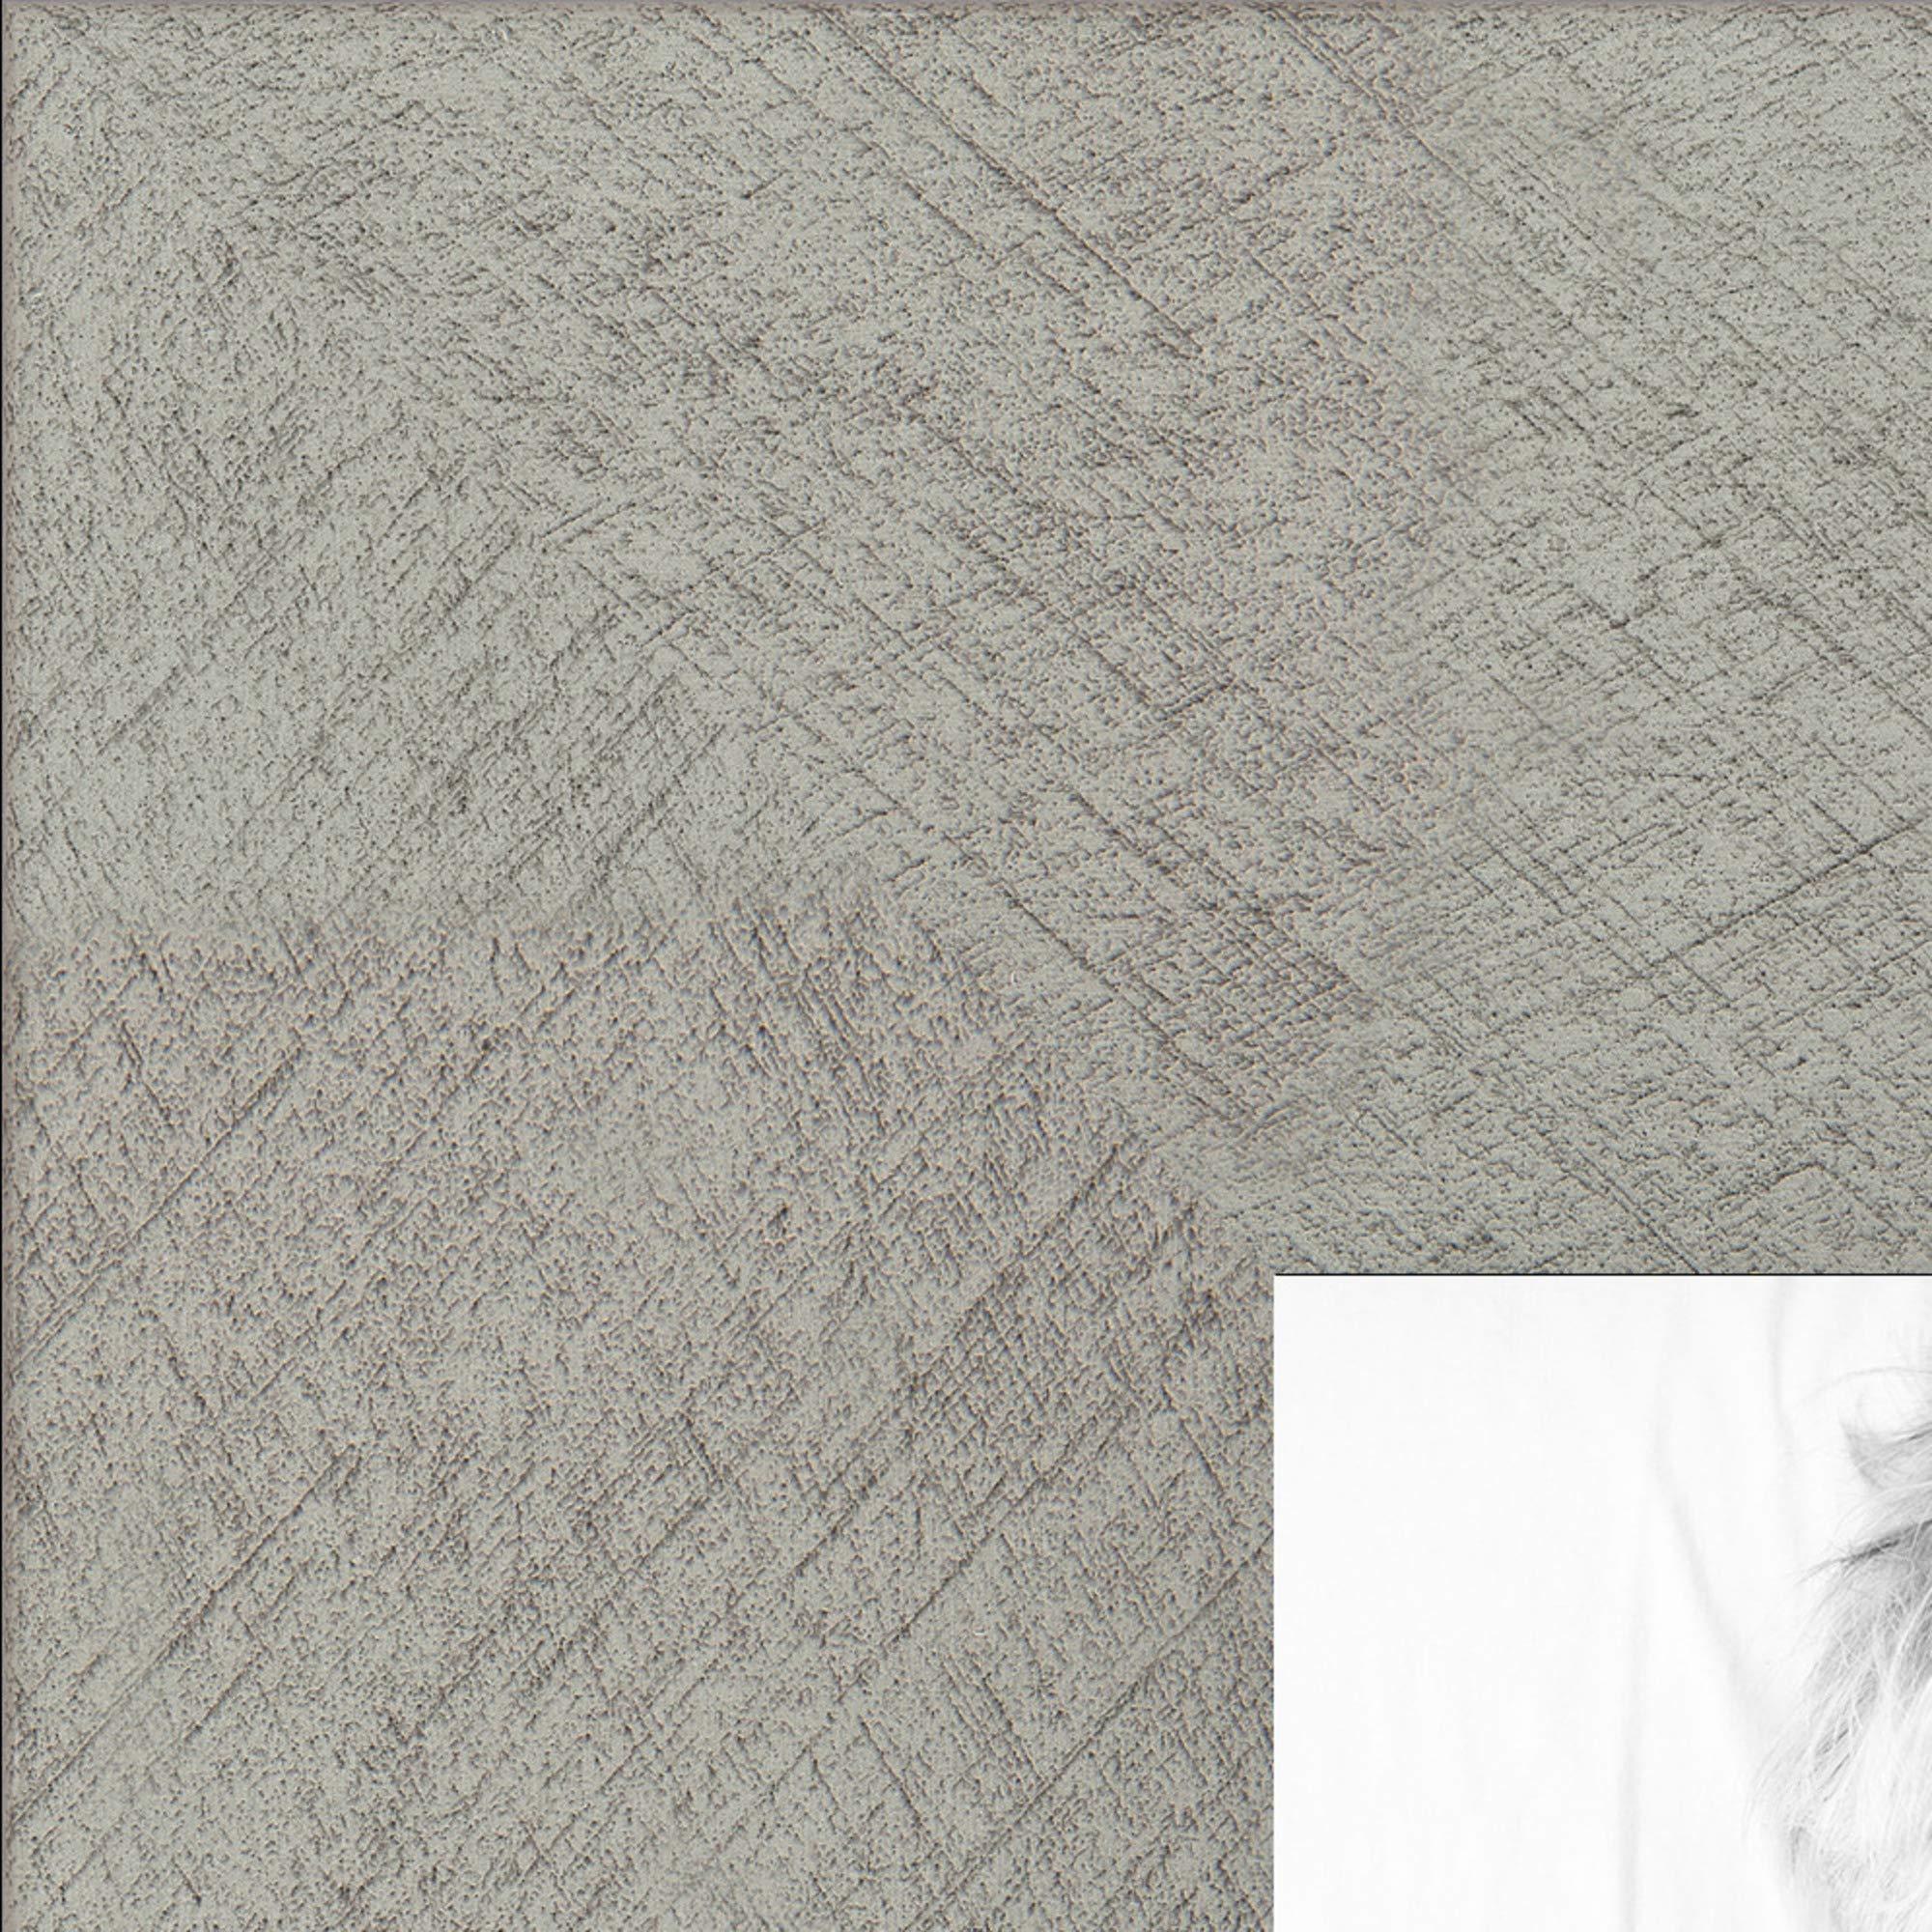 ArtToFrames 7x20 inch Metallic Deco Silver Picture Frame, 2WOM0066-20277-YSLV-7x20